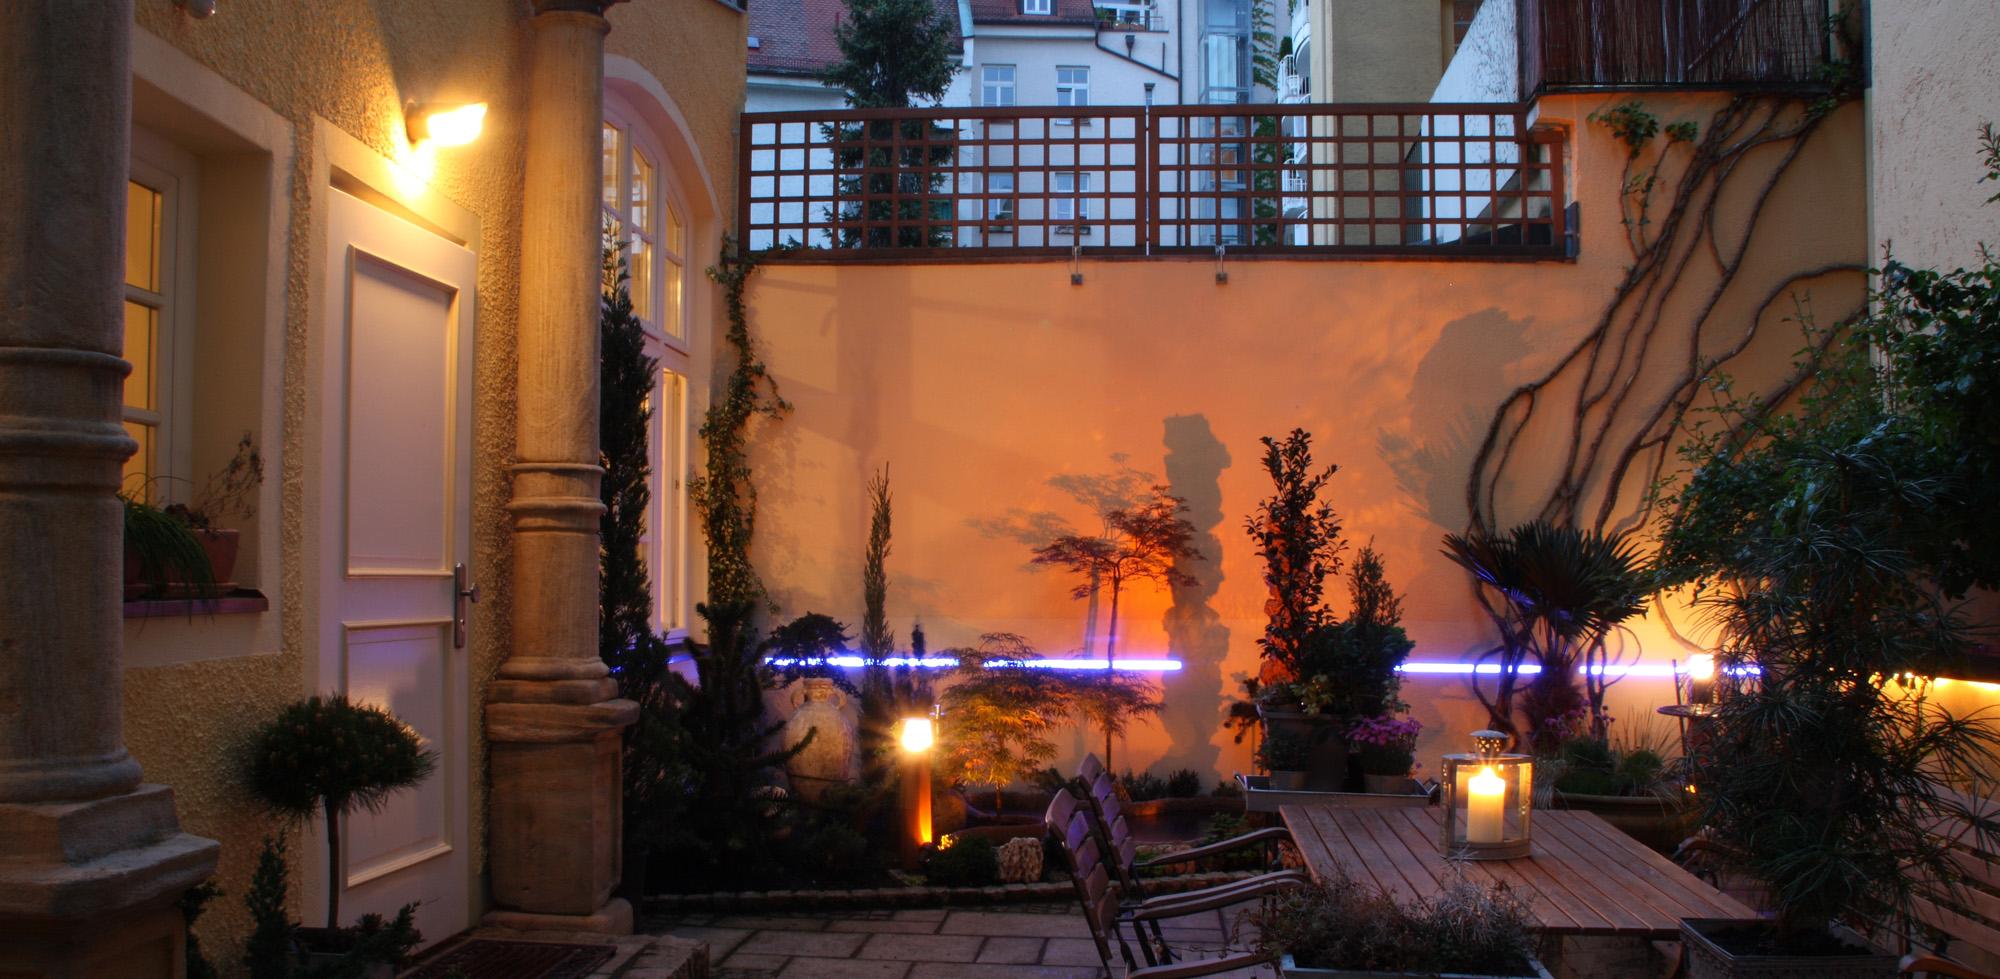 peter h fner innenarchitekt in m nchen. Black Bedroom Furniture Sets. Home Design Ideas